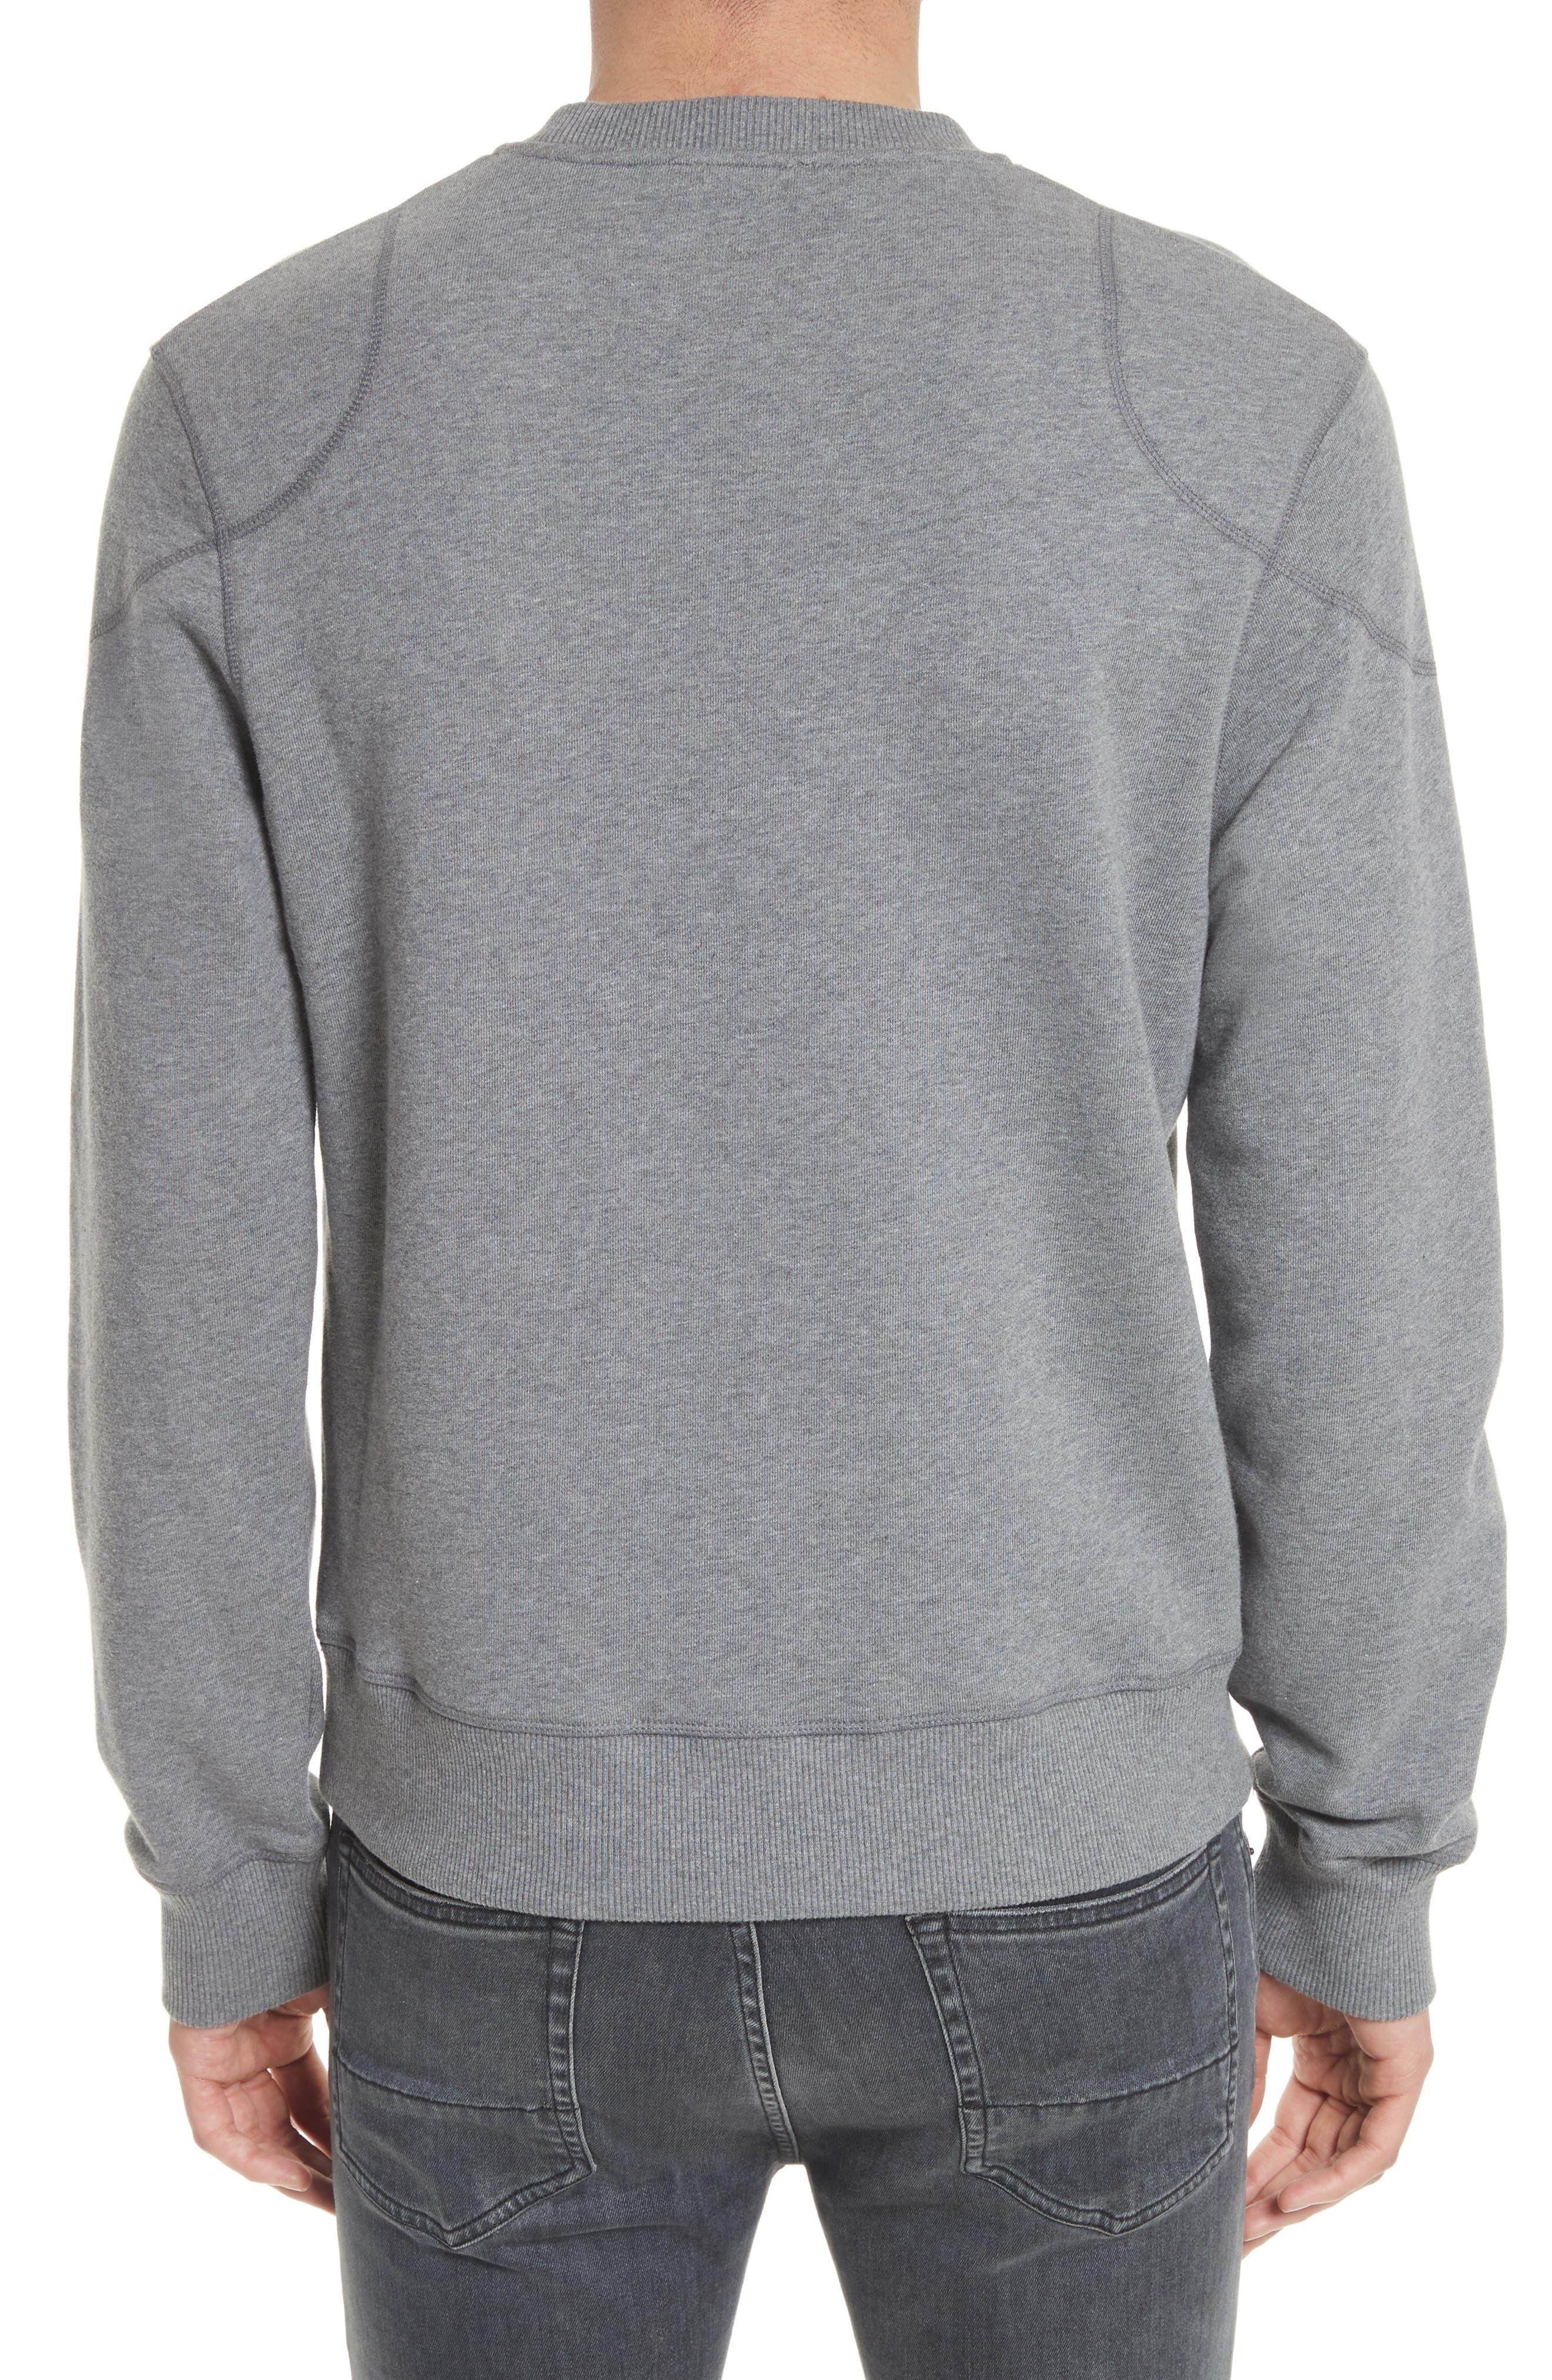 Jefferson Fleece Sweatshirt,                             Alternate thumbnail 2, color,                             020